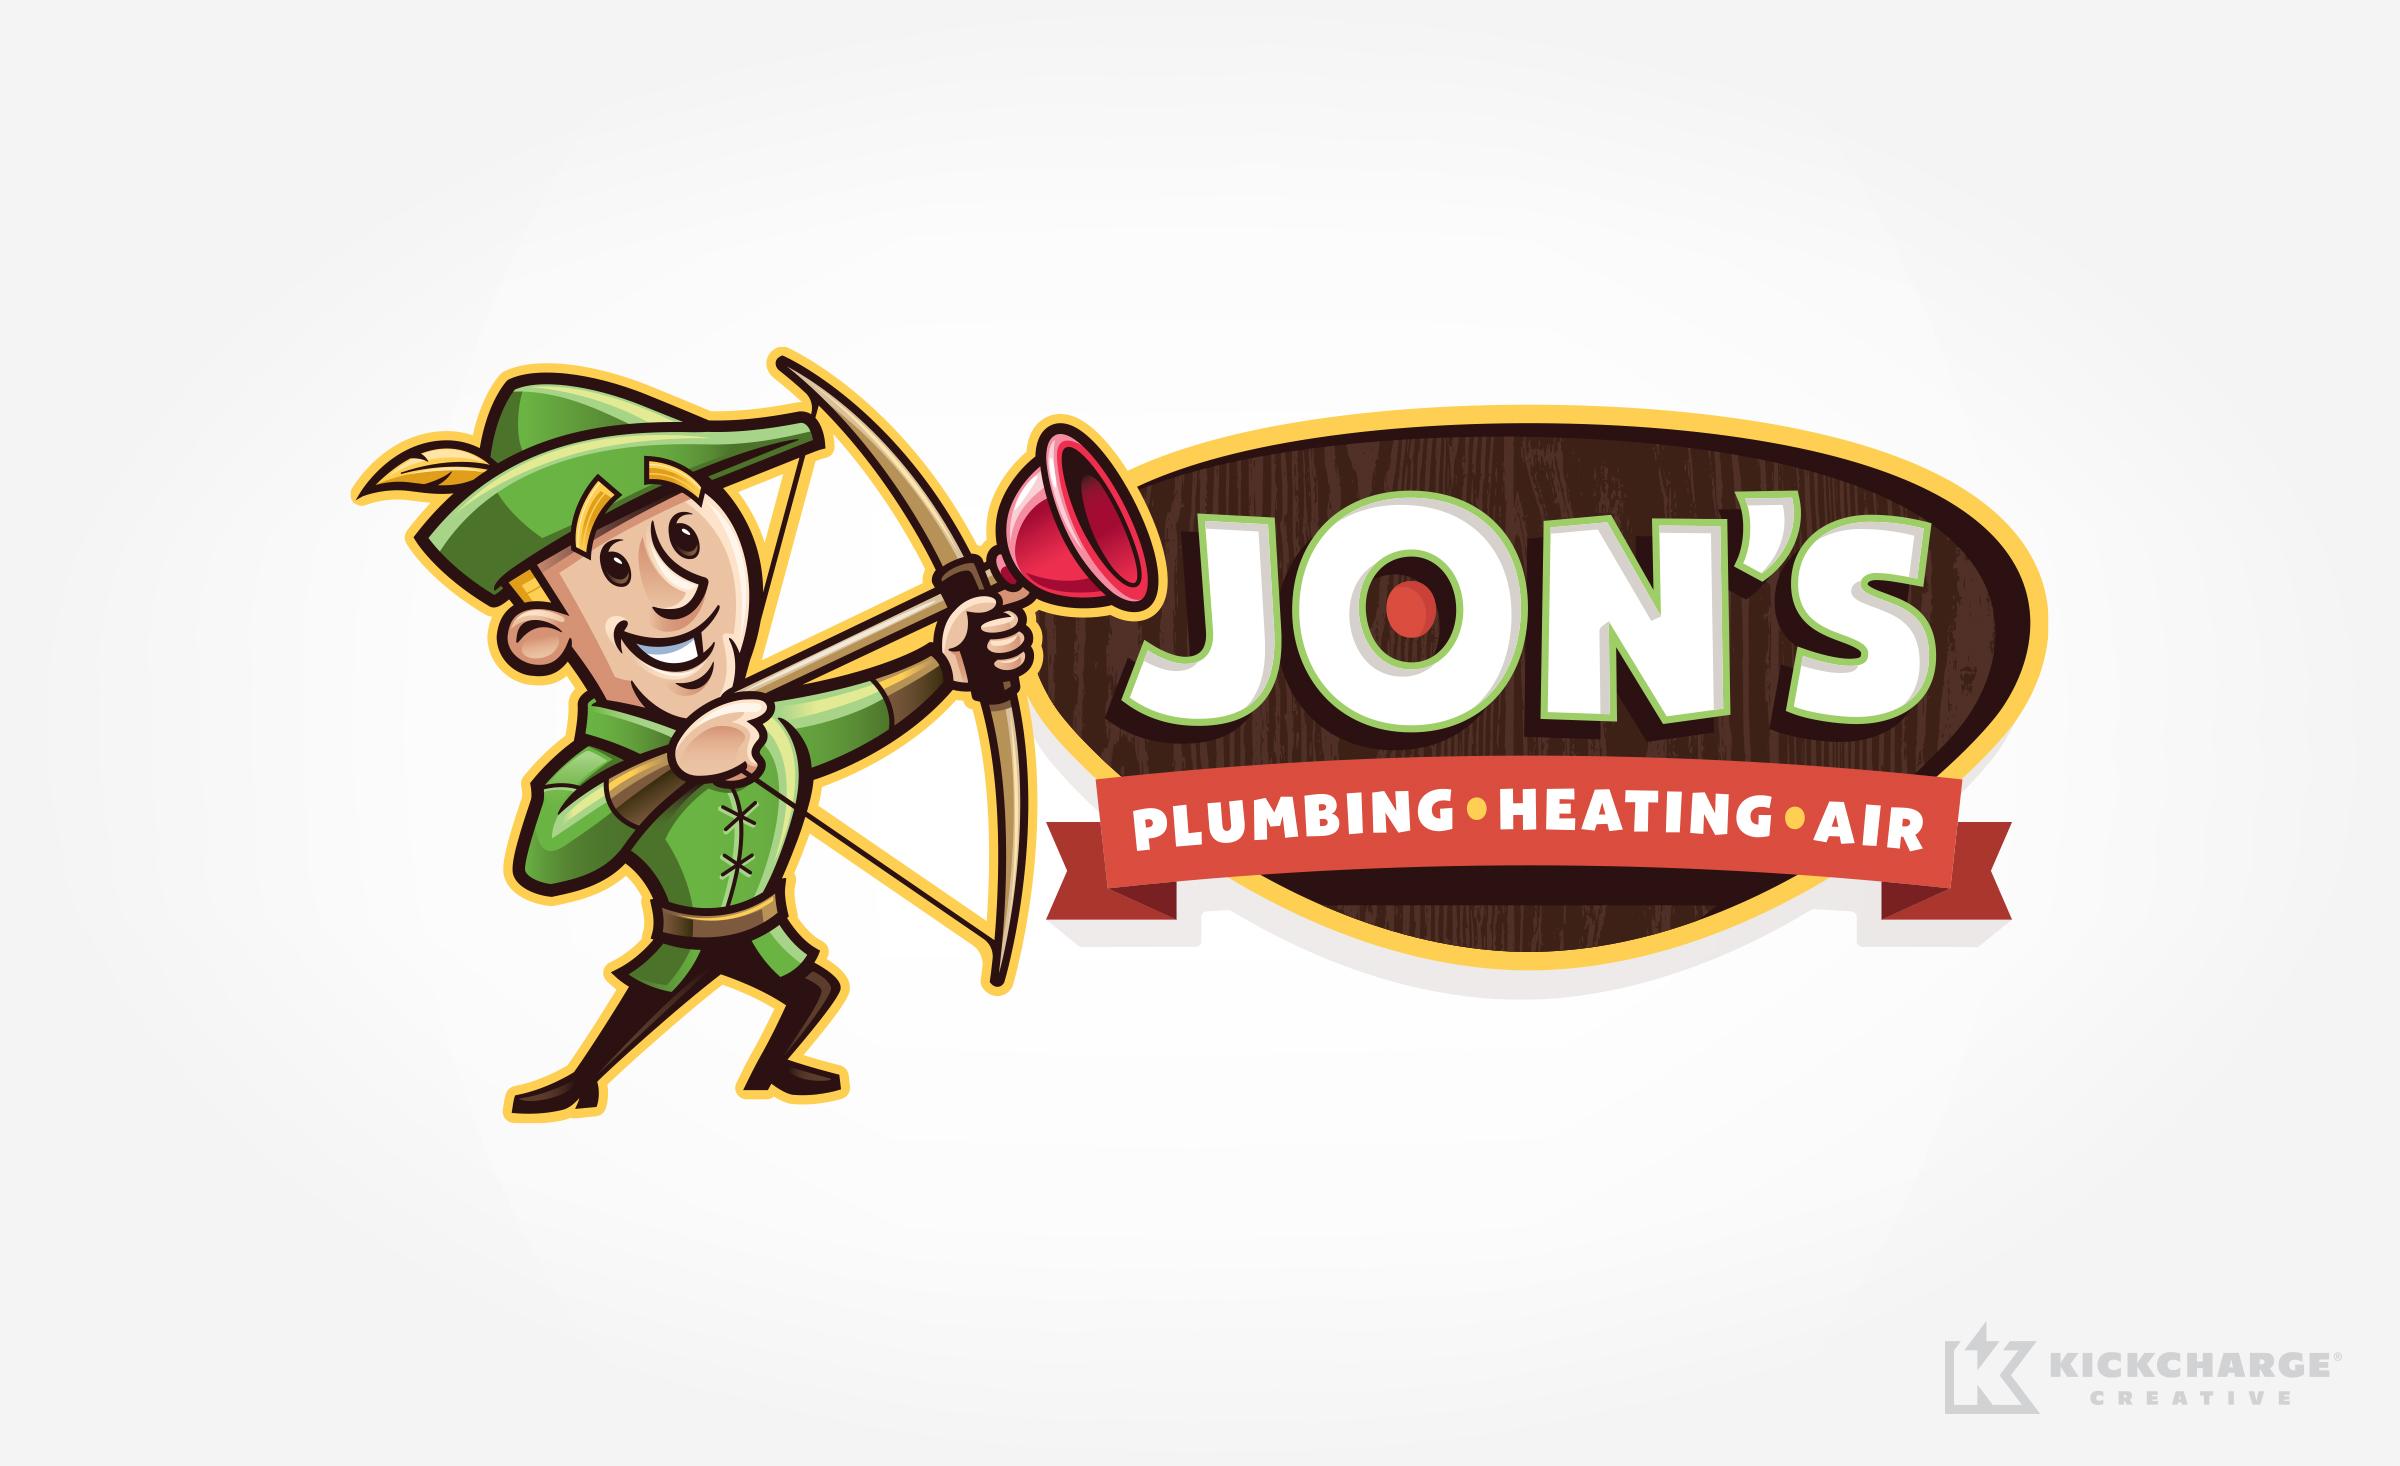 hvac and plumbing logo for Jon's Plumbing, Heating & Air